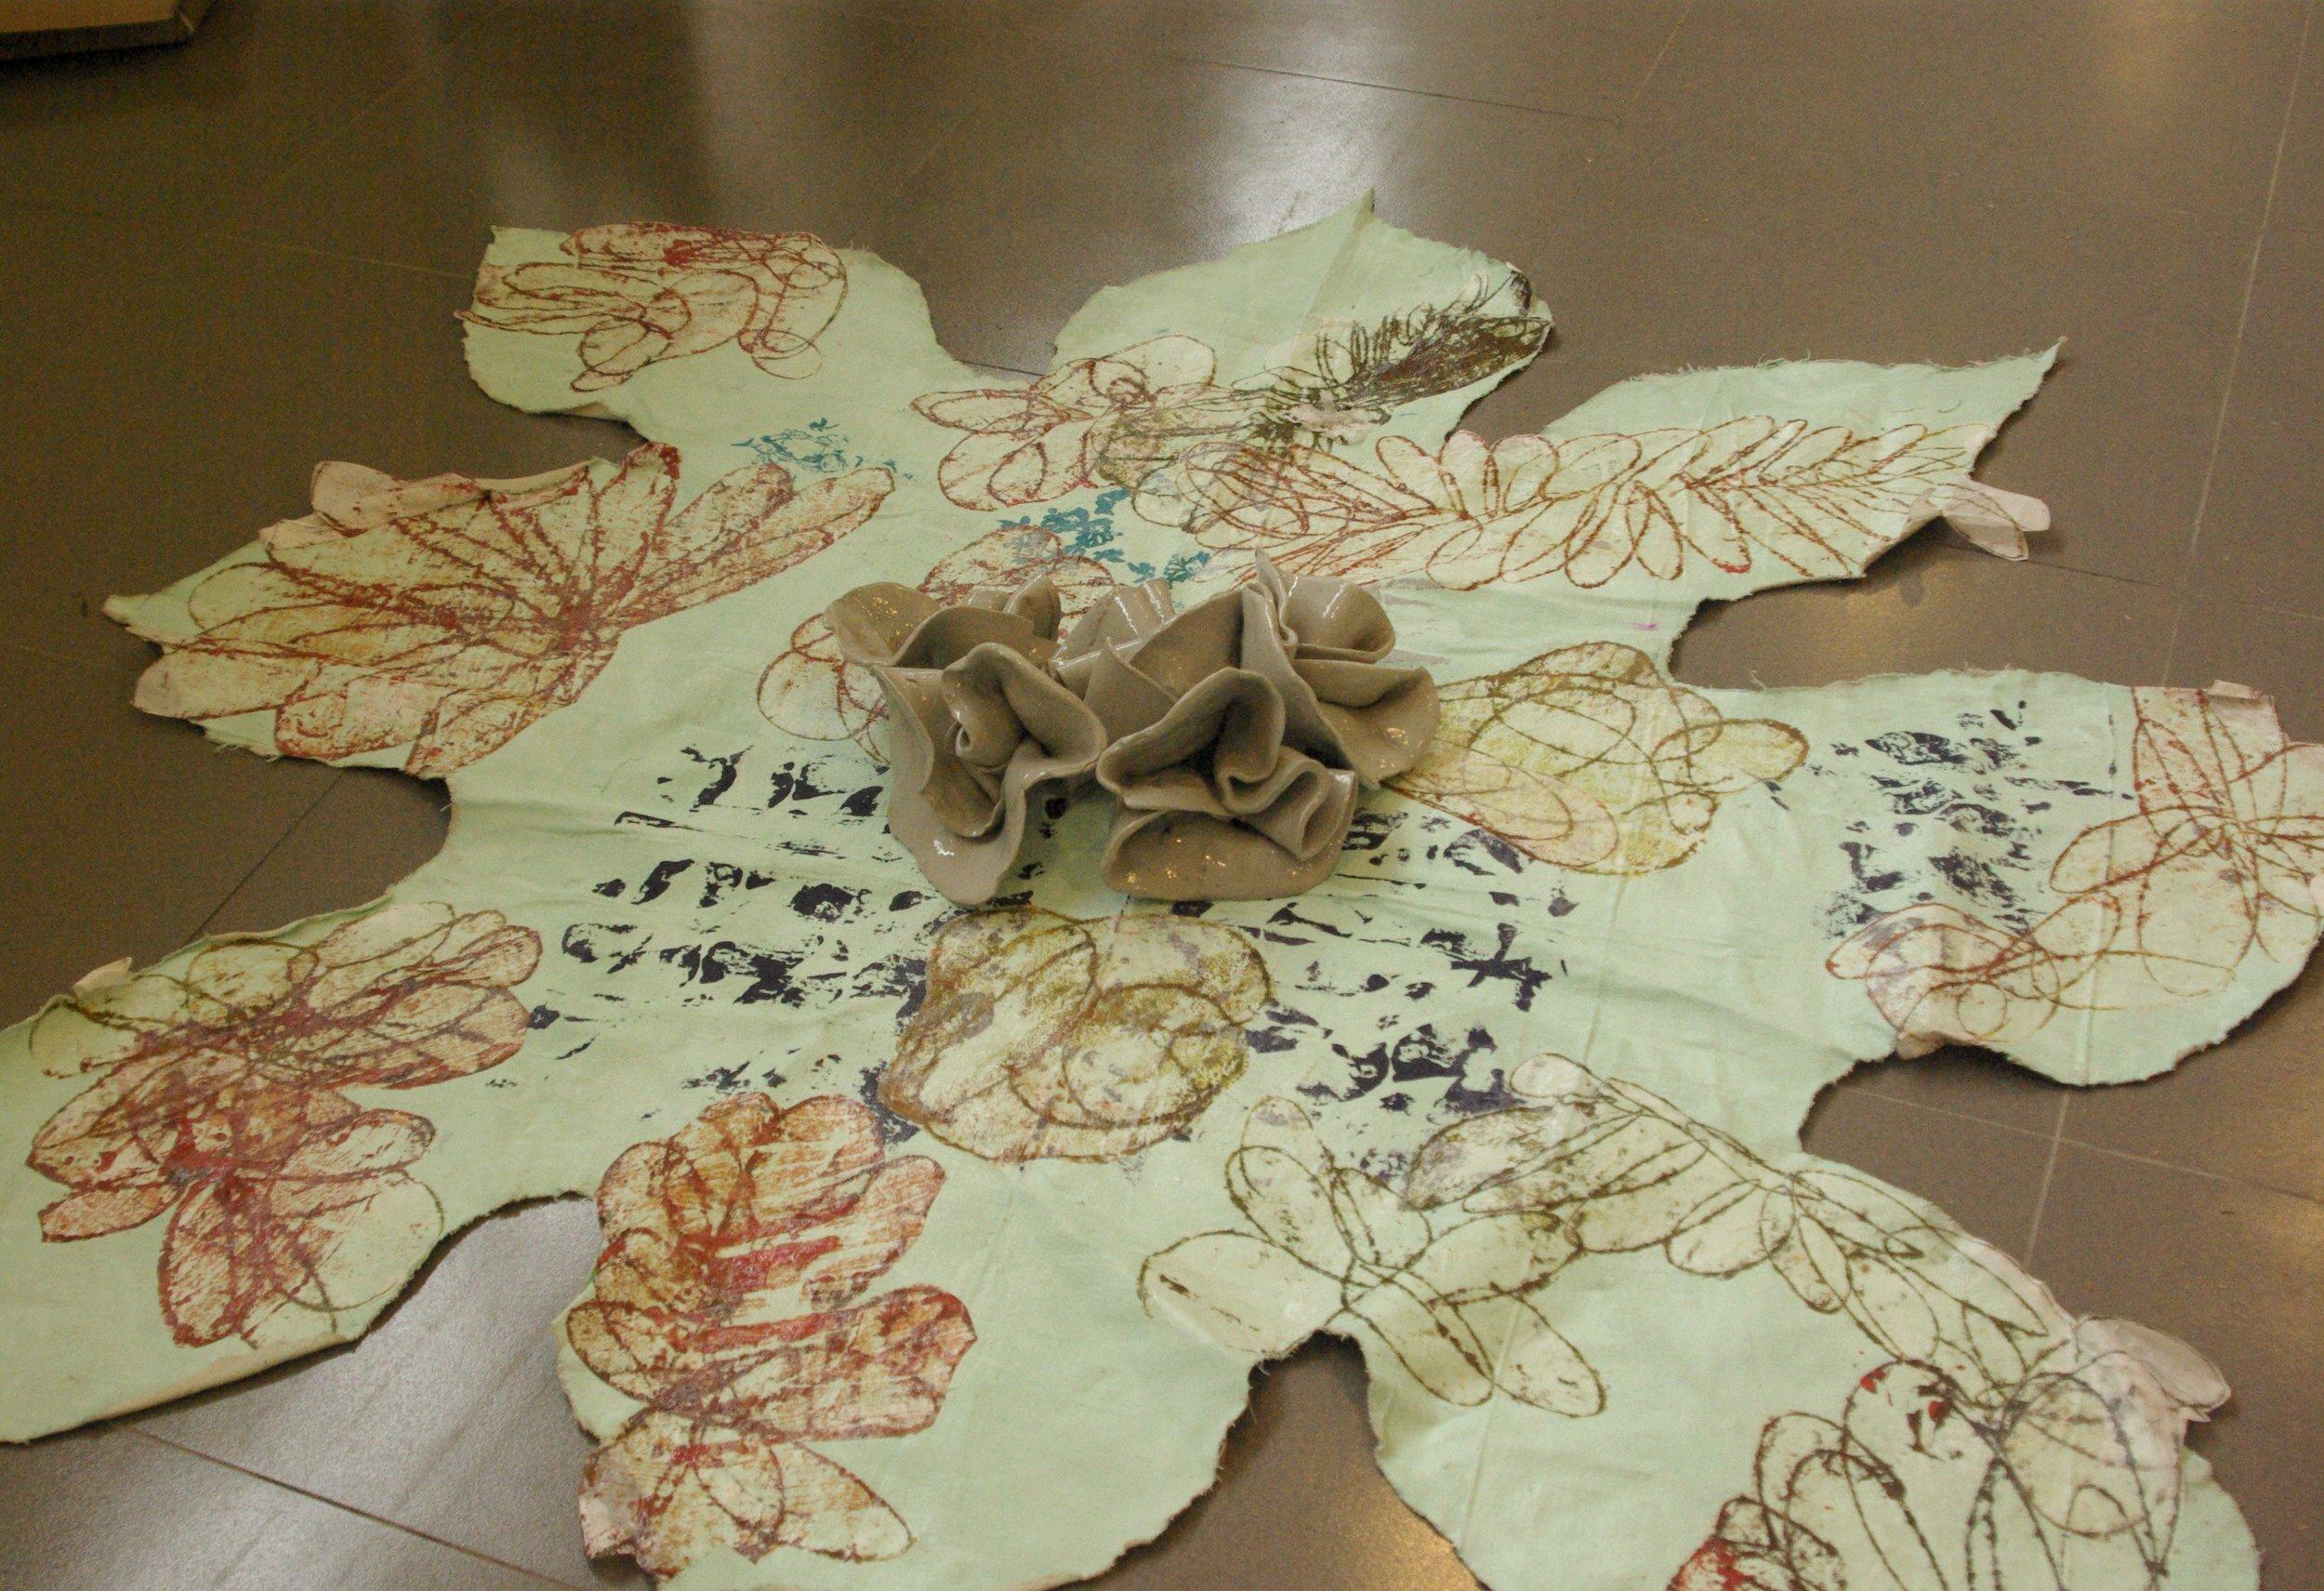 Sum of the Parts, Vietnam University of Fine Arts, 2015